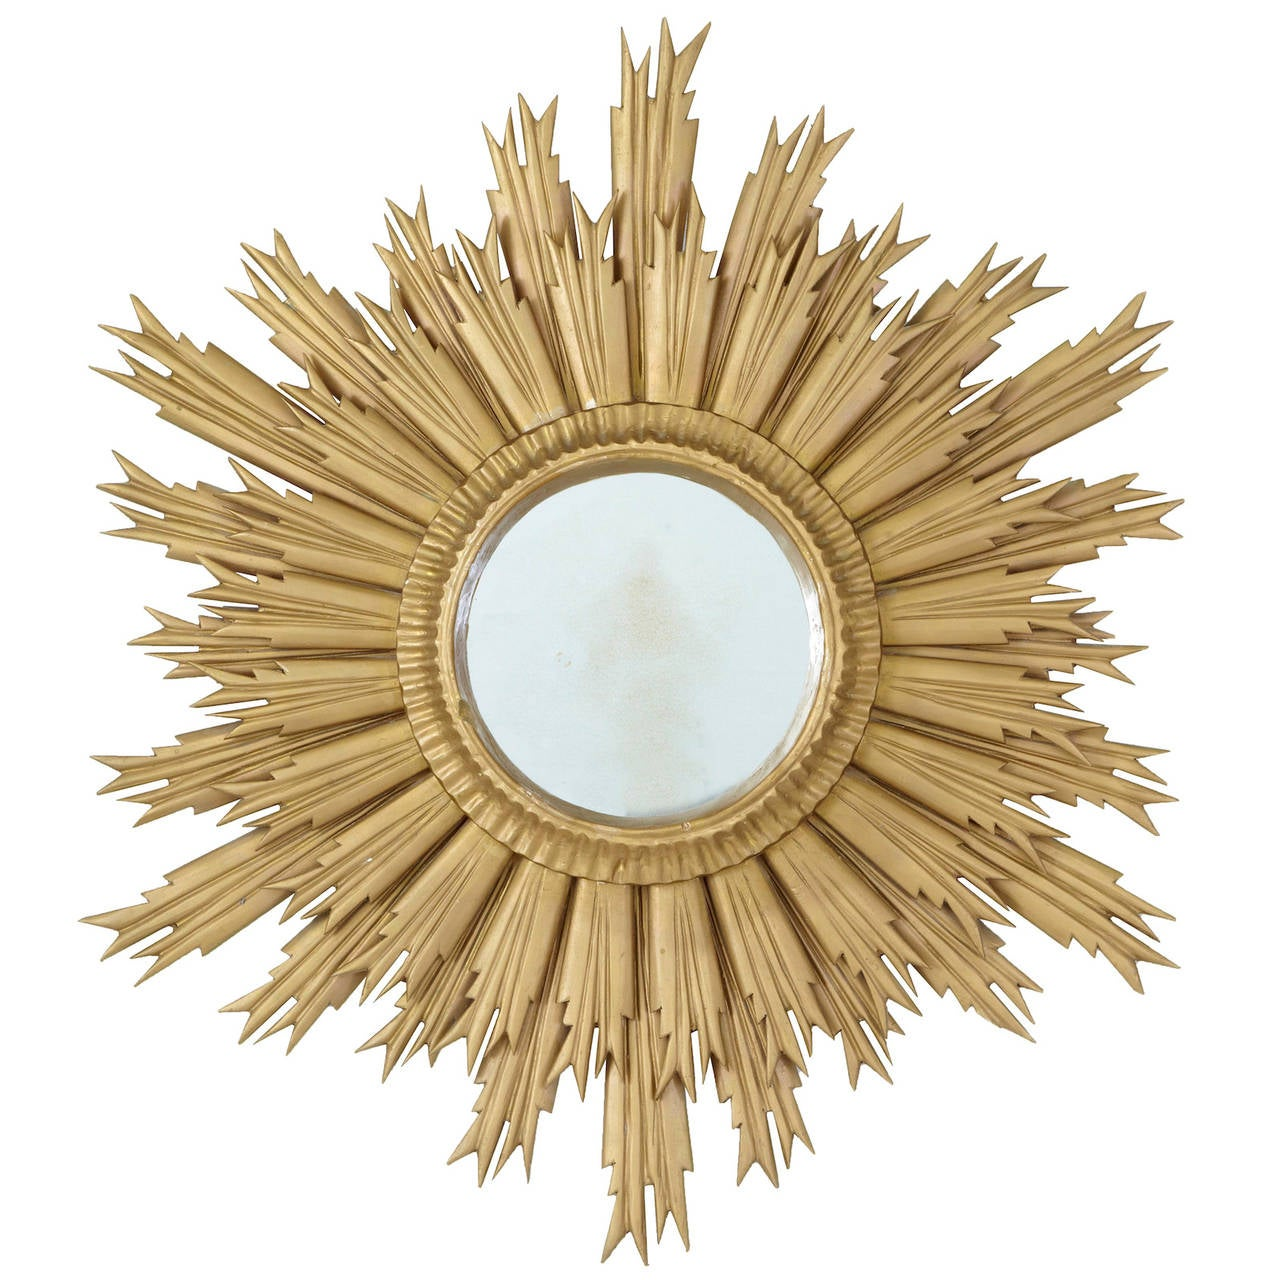 Late Art Deco Sunburst Mirror, circa 1950